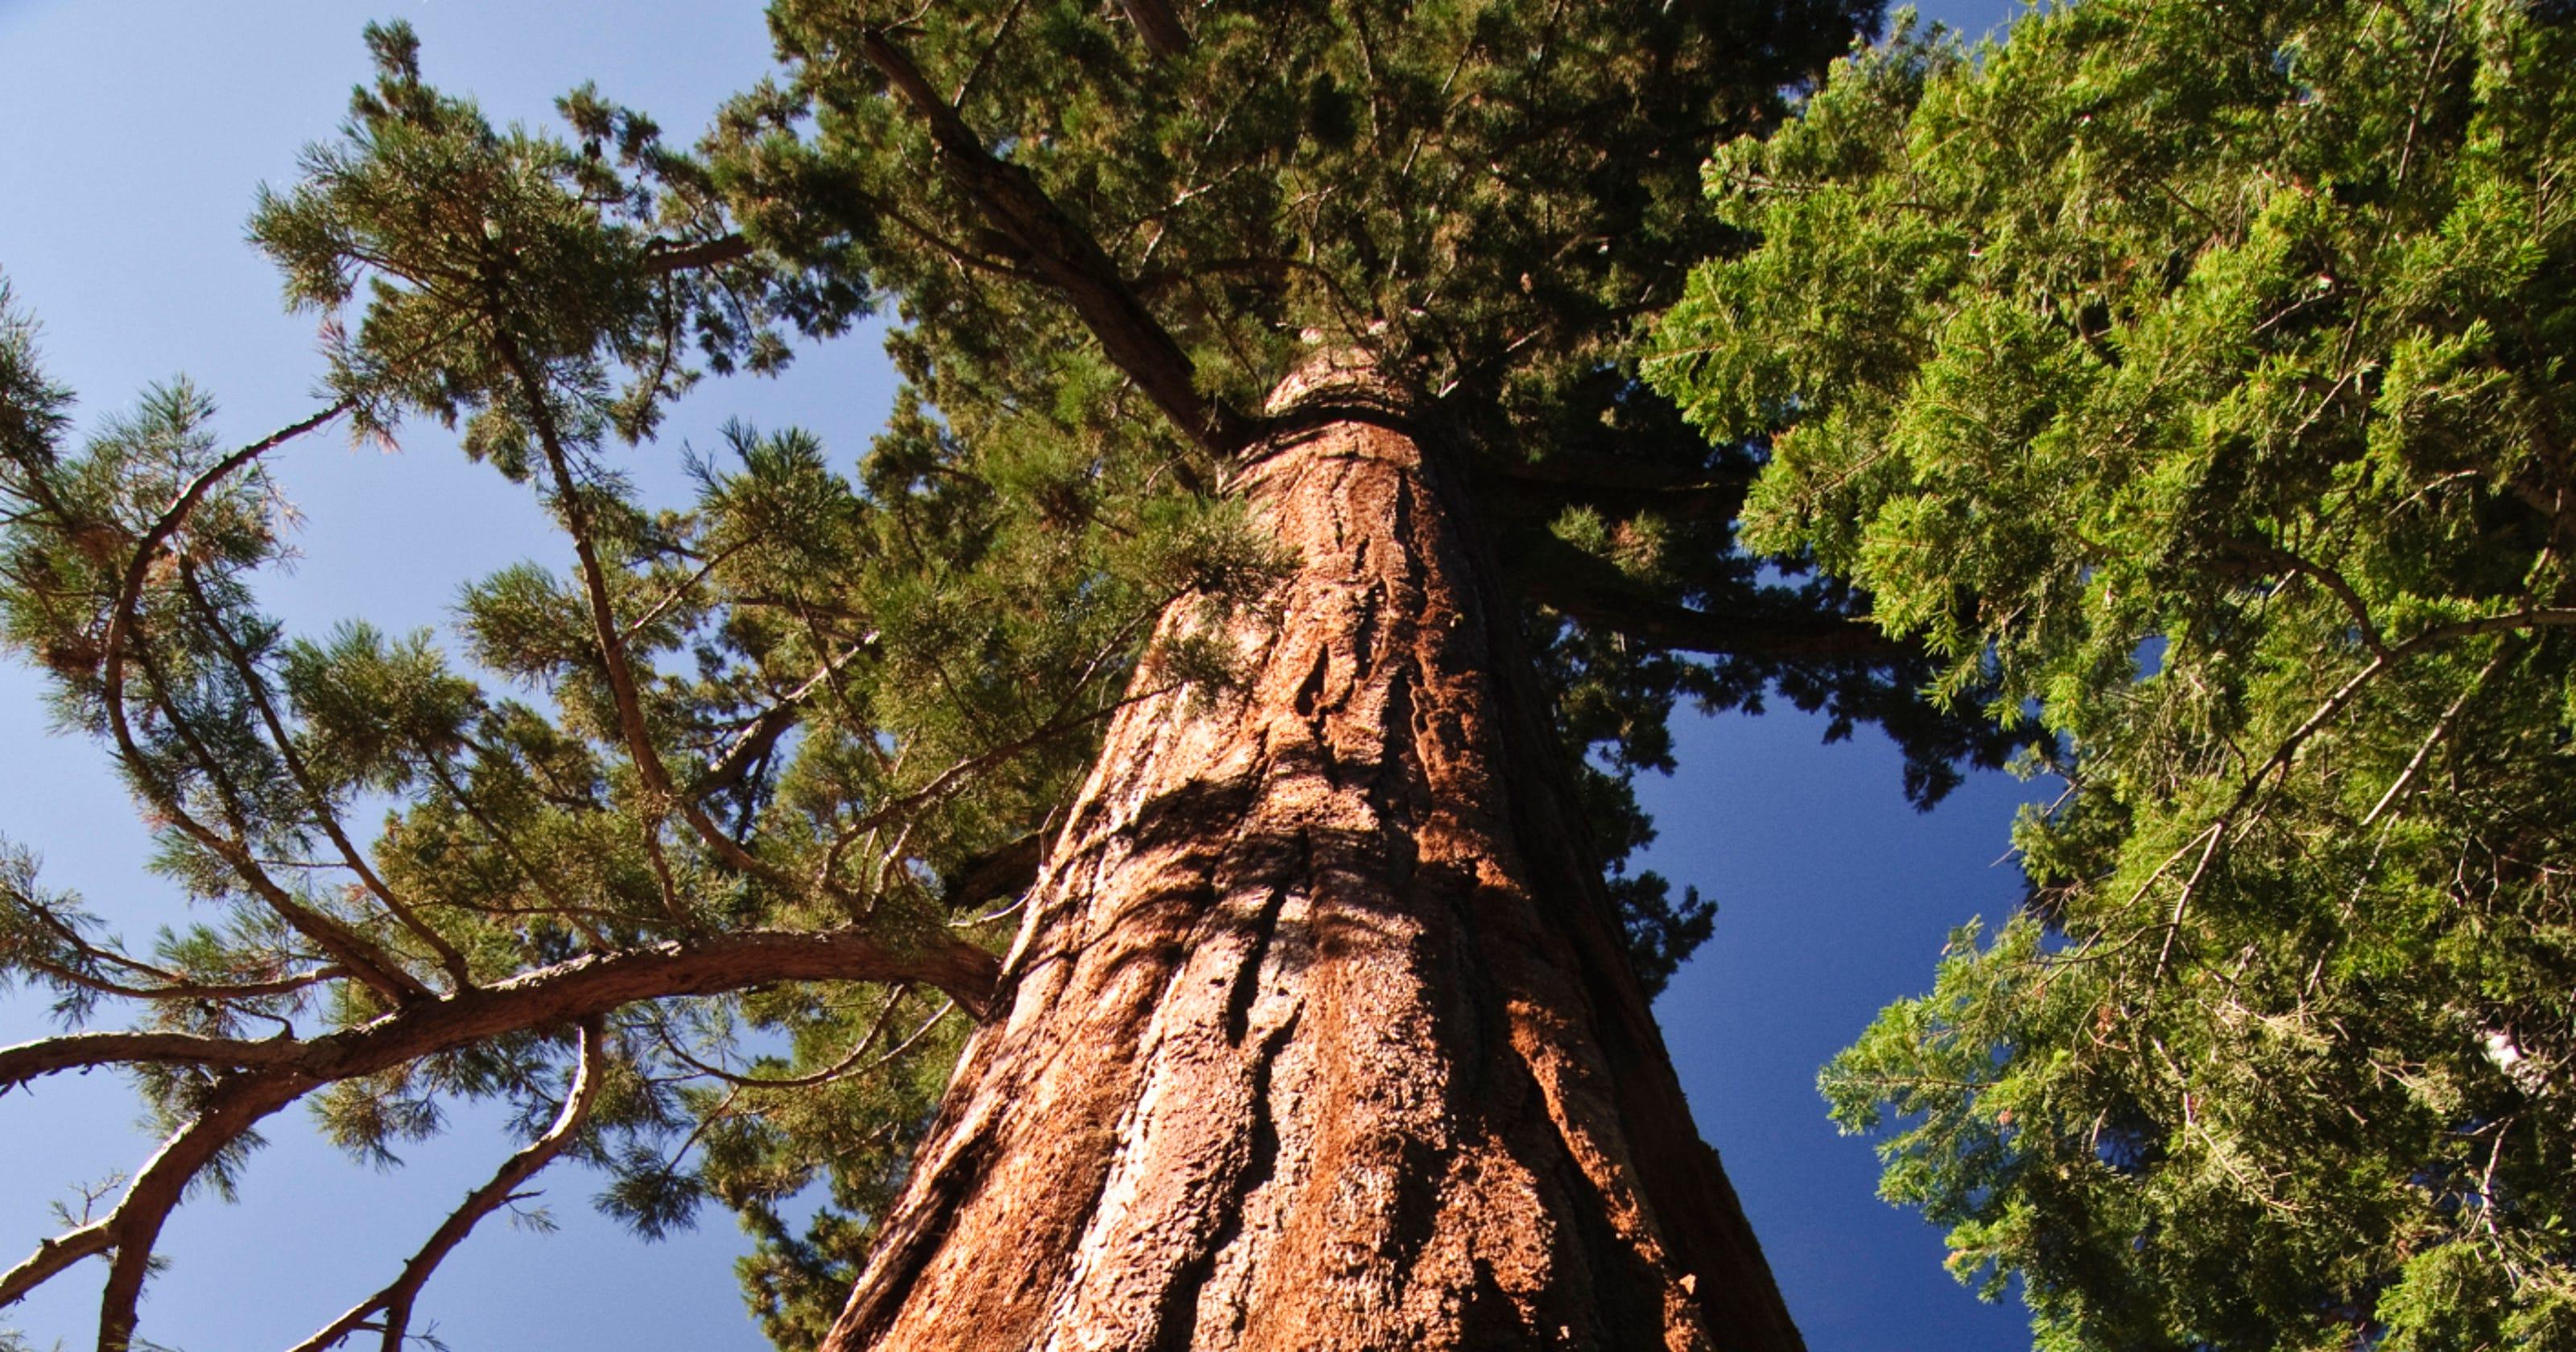 U-M botanical garden displays clone of ancient redwood